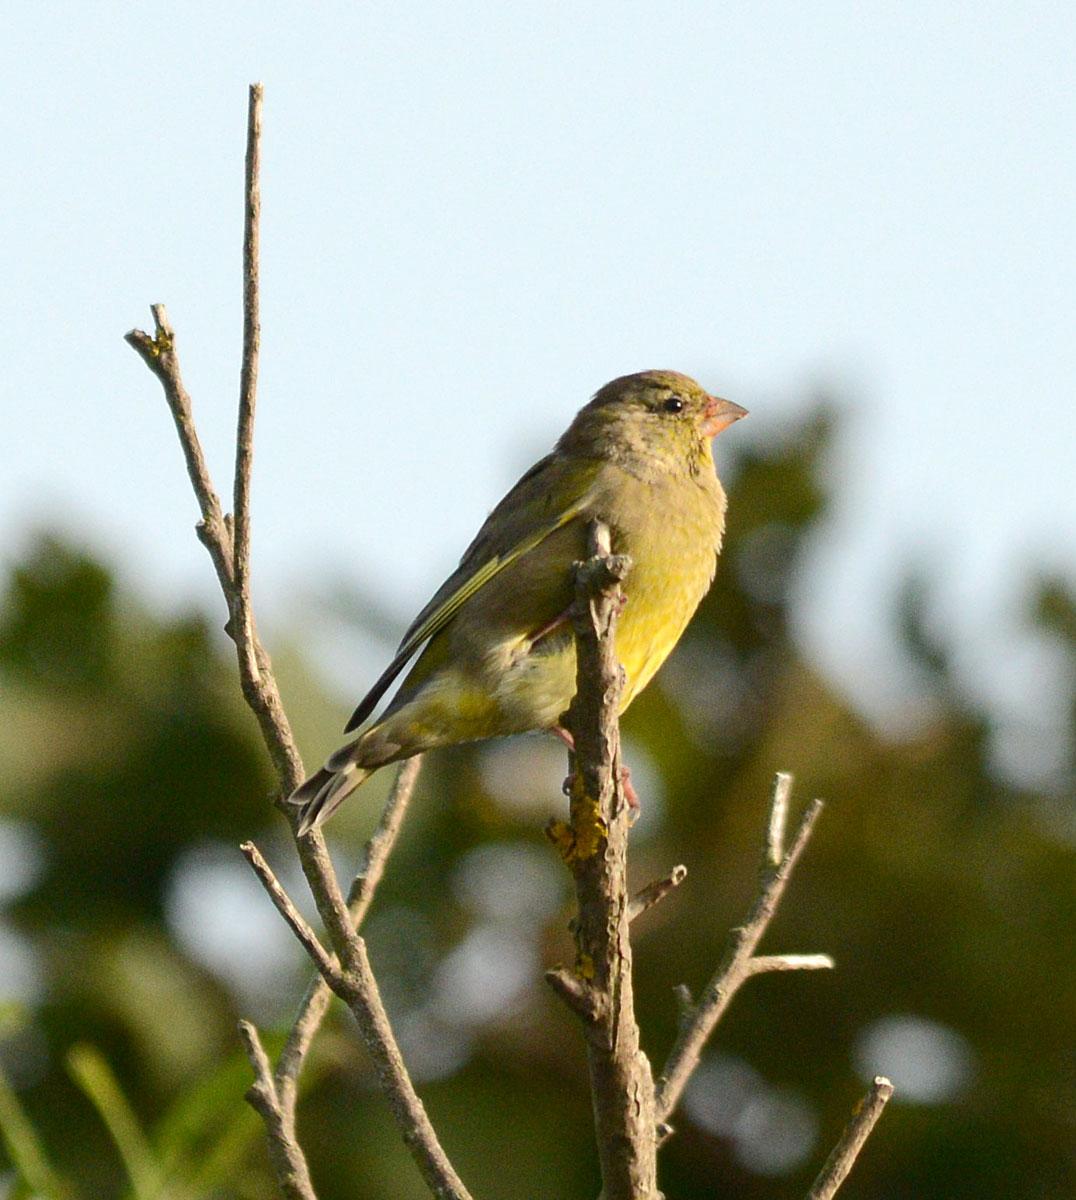 Female greenfinch.